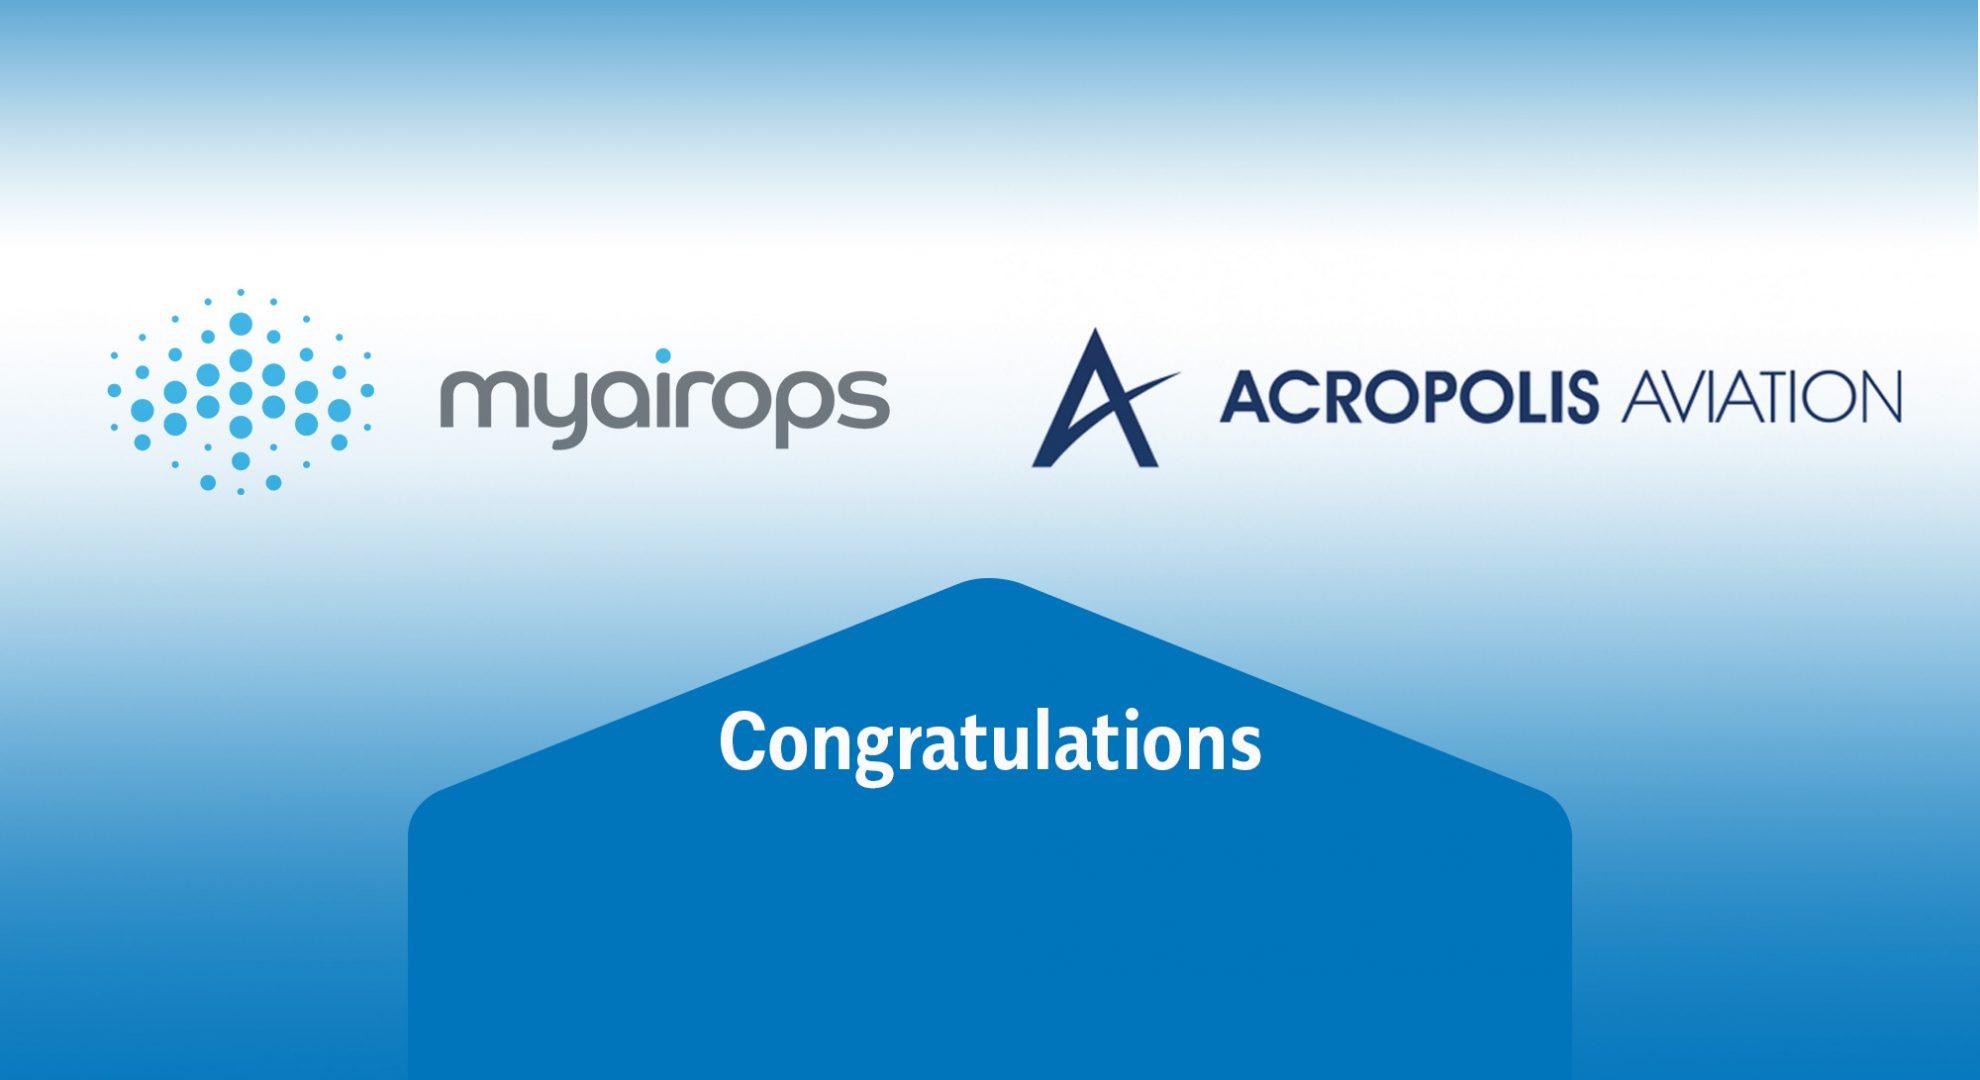 Acropolis Aviation select myairops flight header image